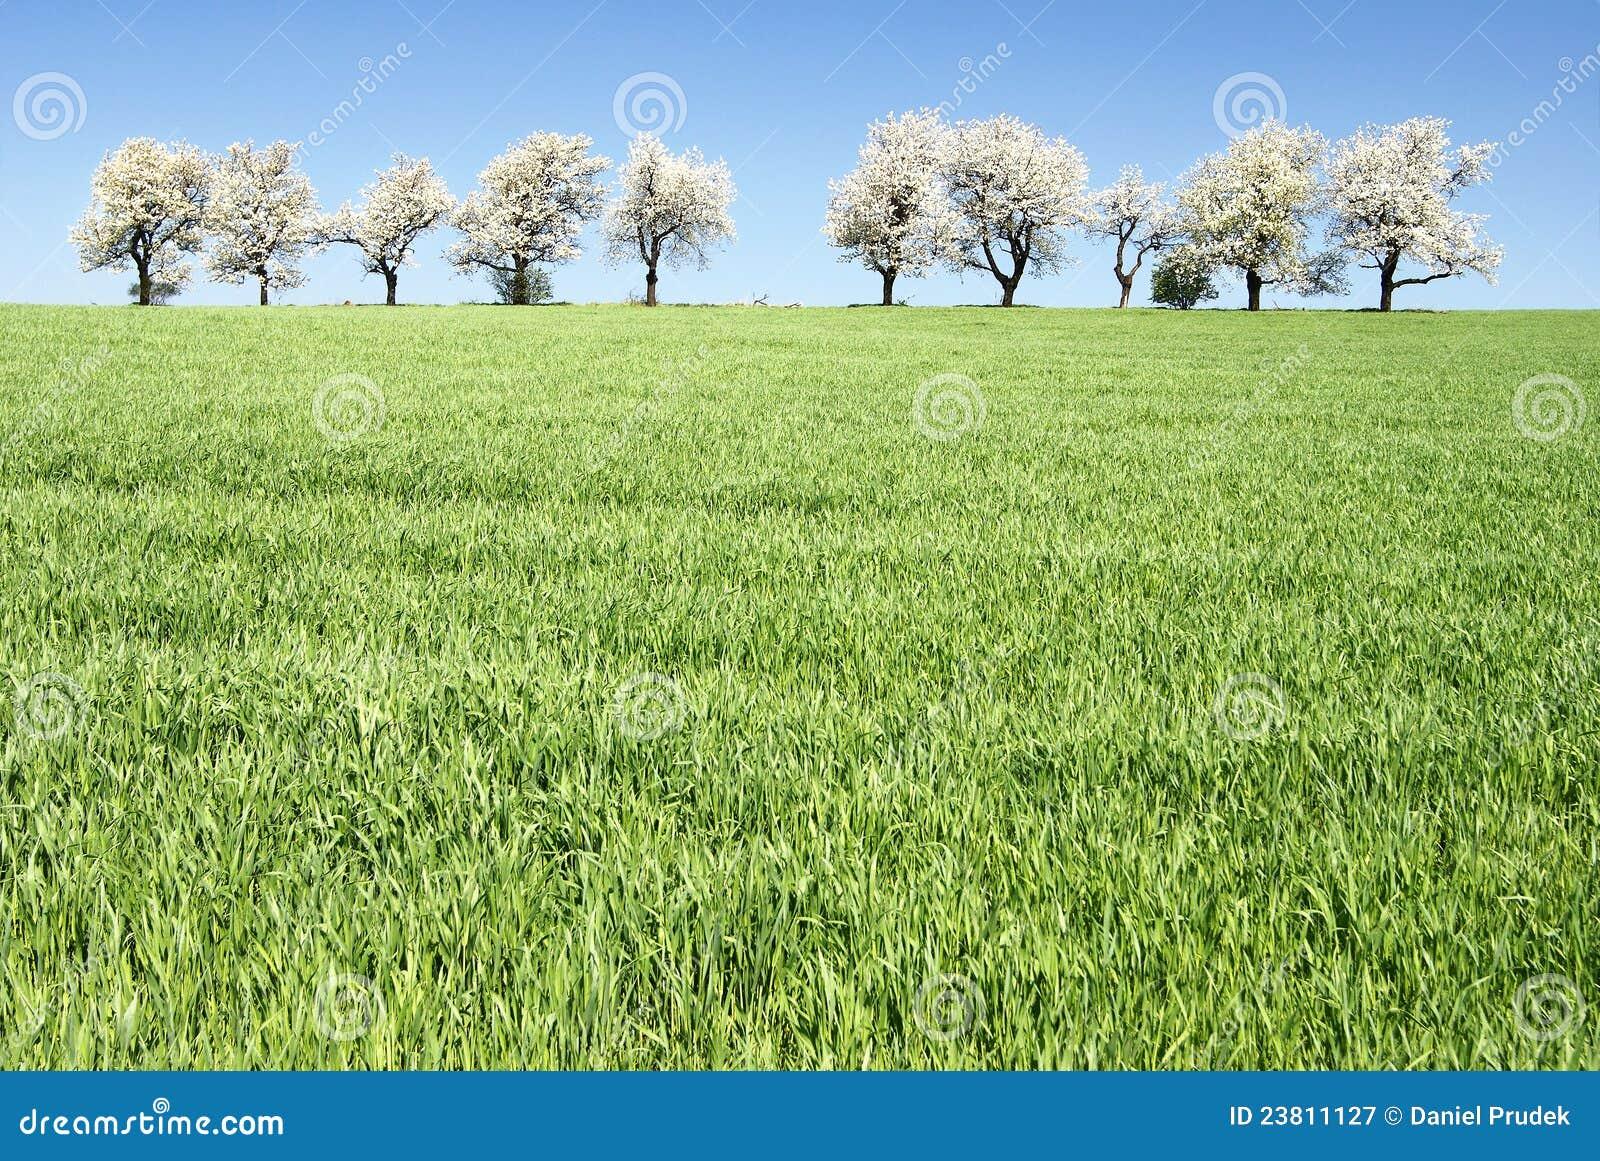 Cherryet fields trees